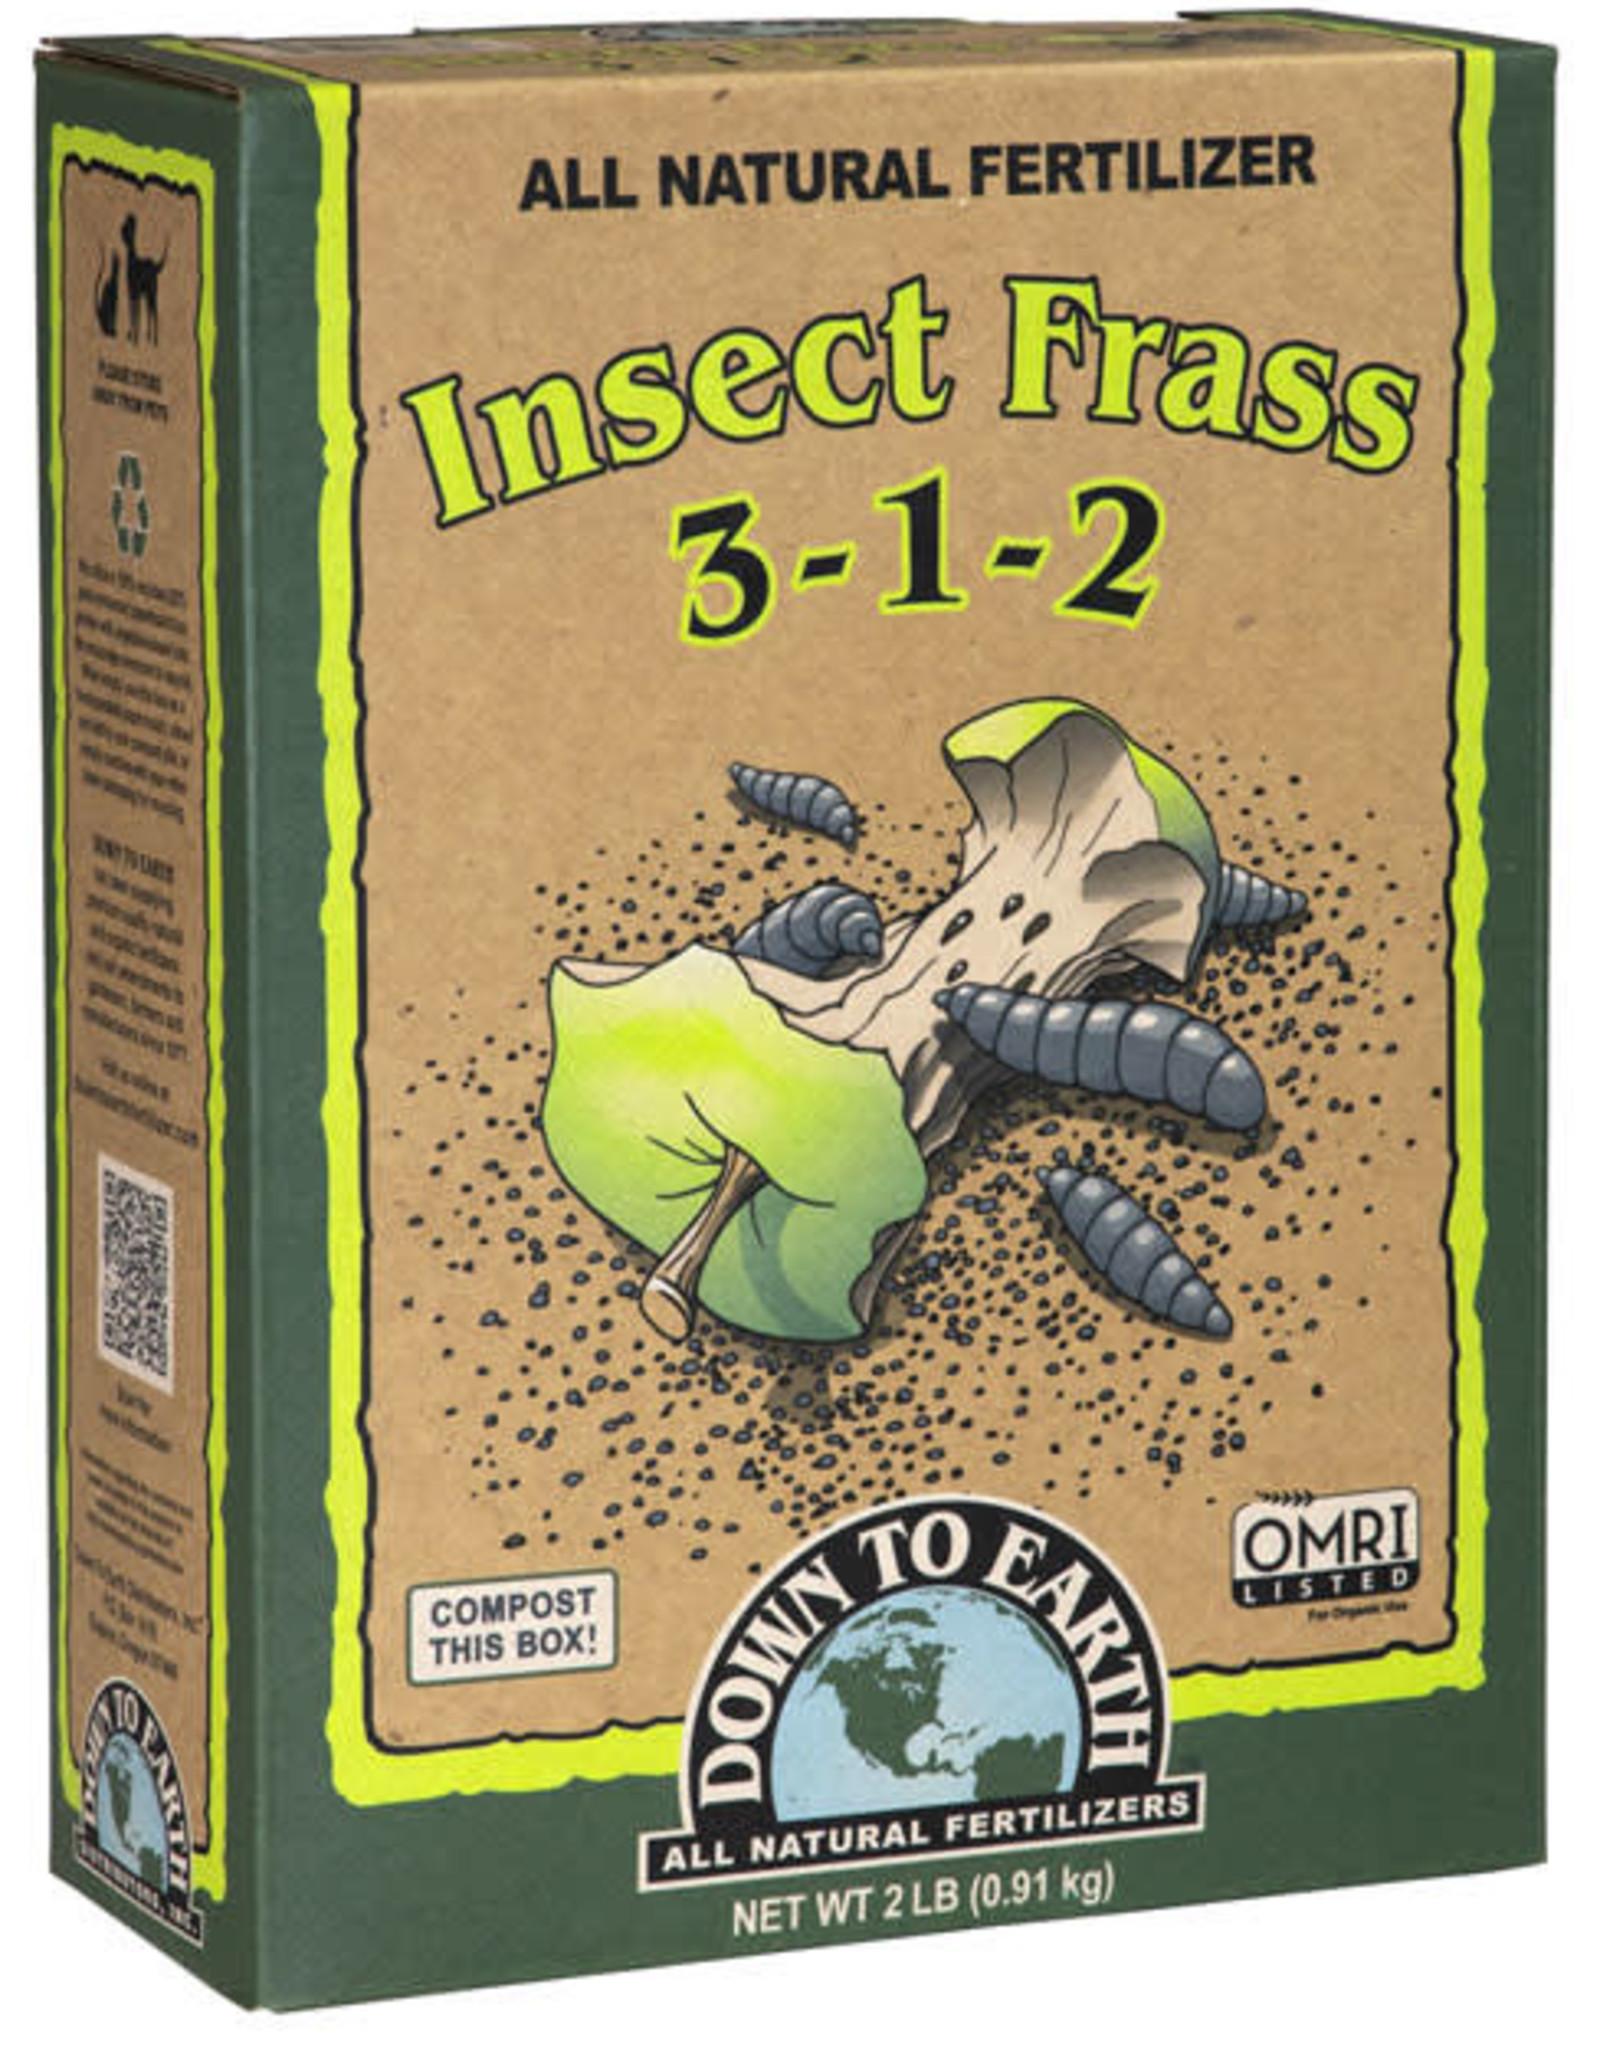 Insect Frass Fertilizer 3-1-2